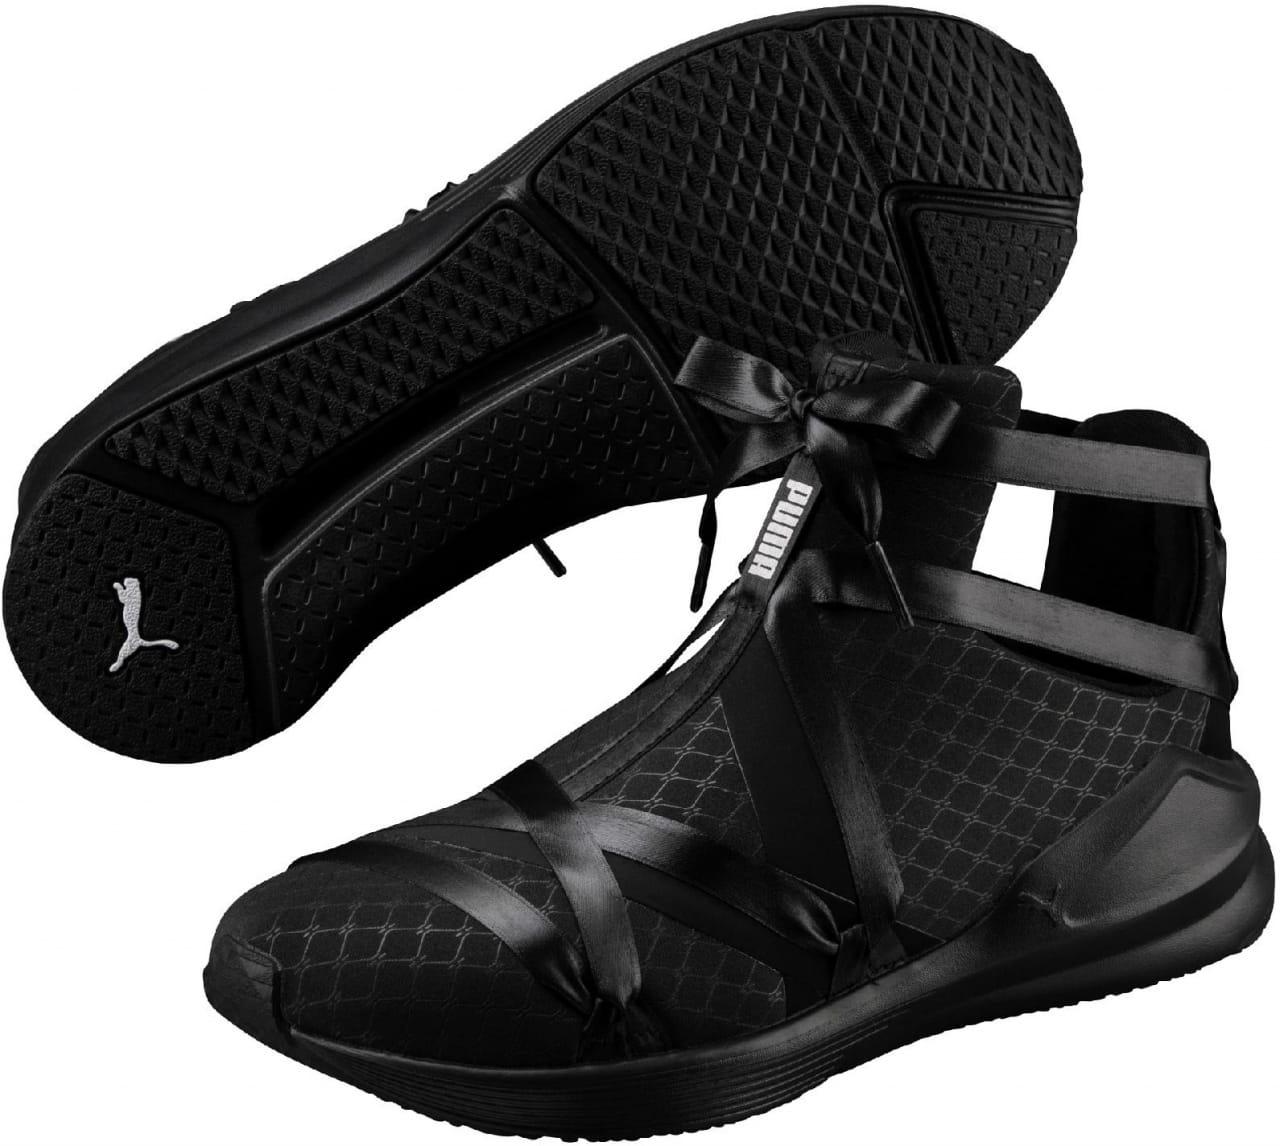 14ffa51abf93b Puma Fierce Rope Satin EP Wn's - dámske fitness topánky | Sanasport.sk